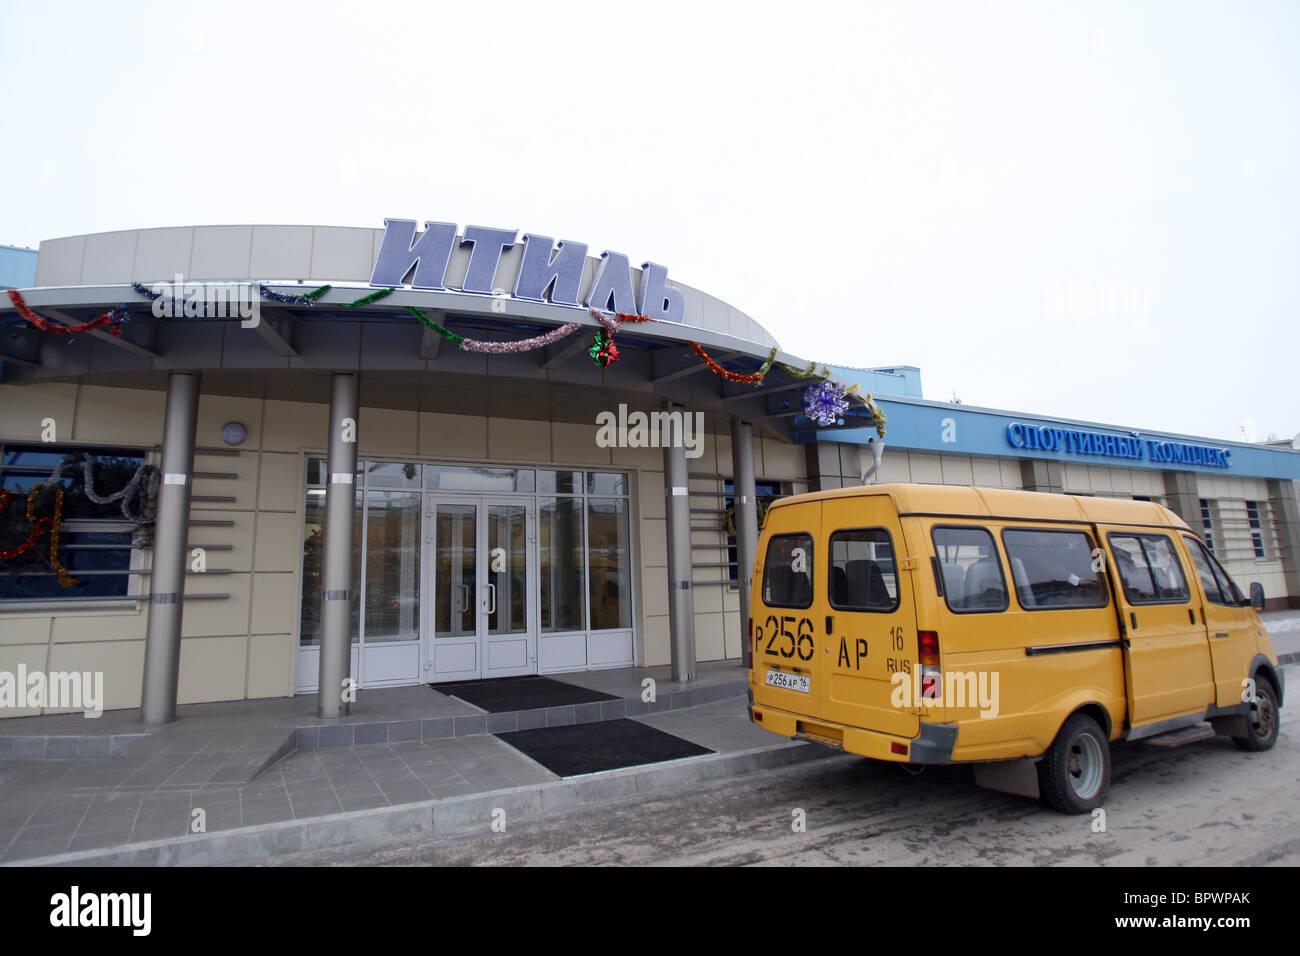 Universiade 2013 facilities unveiled in Kazan - Stock Image